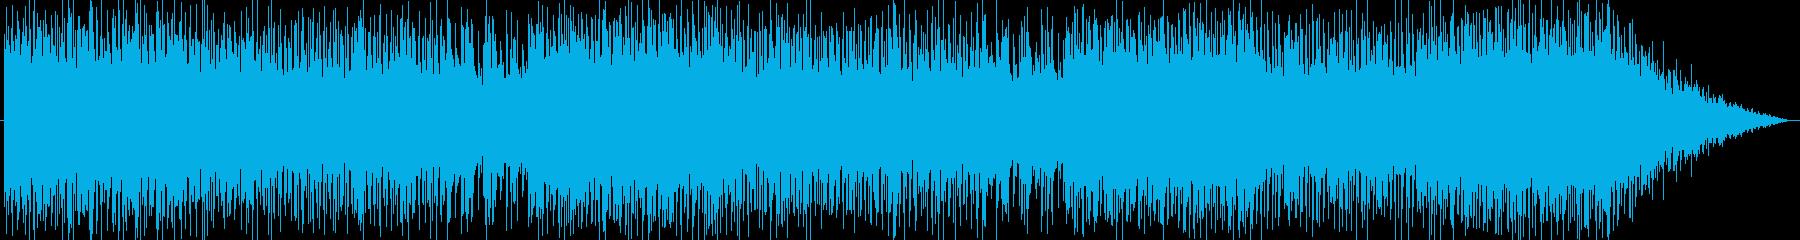 HARD ROCK、SAD BGM227の再生済みの波形